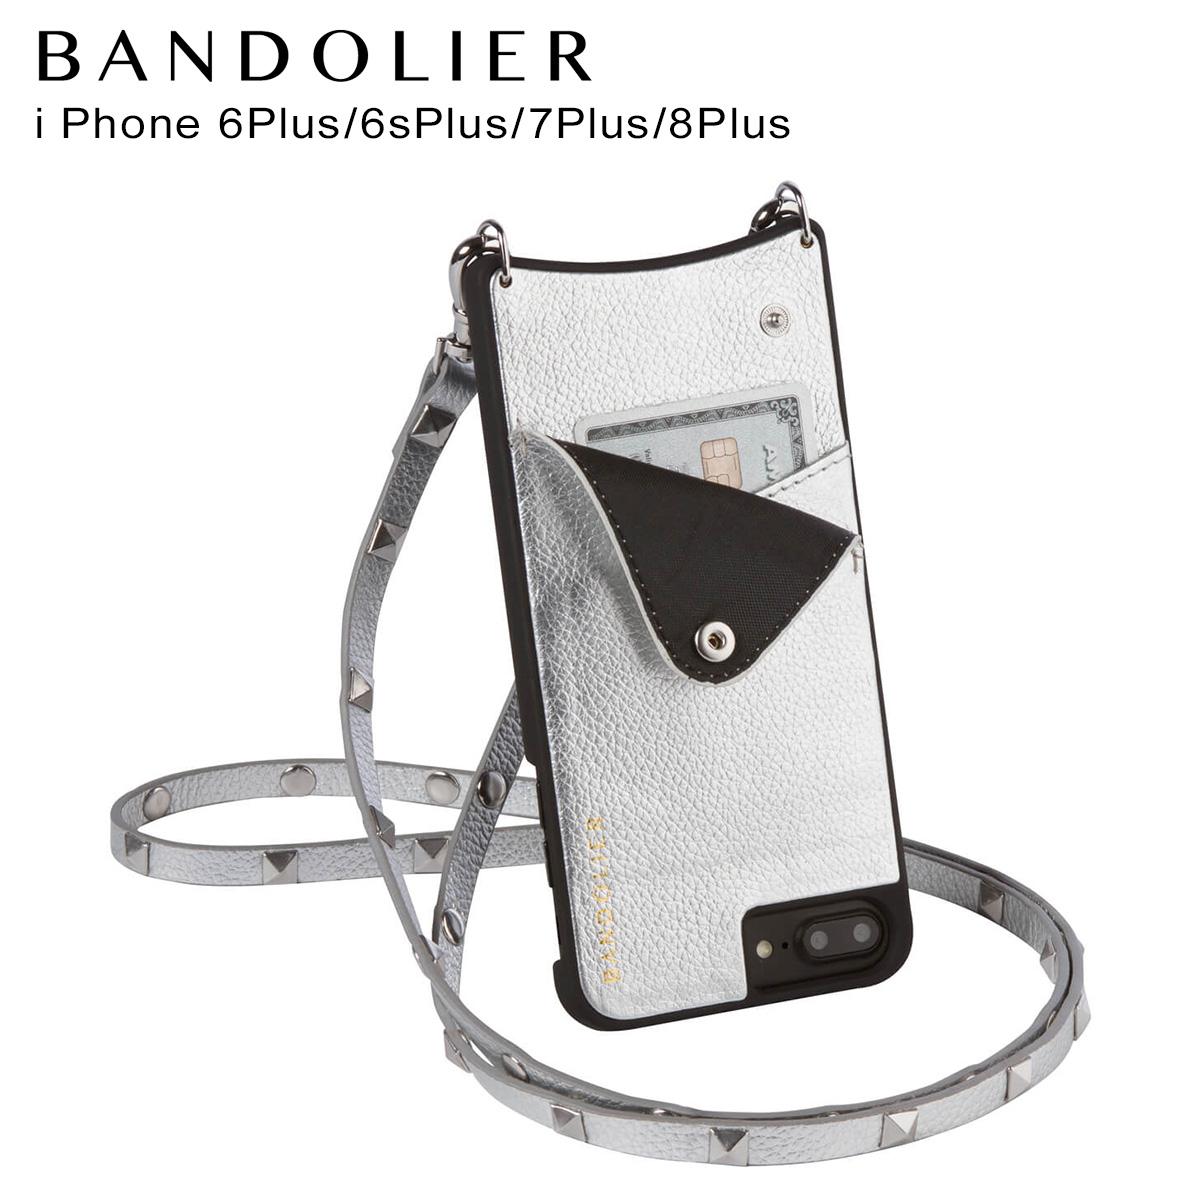 BANDOLIER iPhone8Plus iPhone7Plus 6sPlus EMMA BLUSH バンドリヤー ケース スマホ アイフォン プラス メンズ レディース